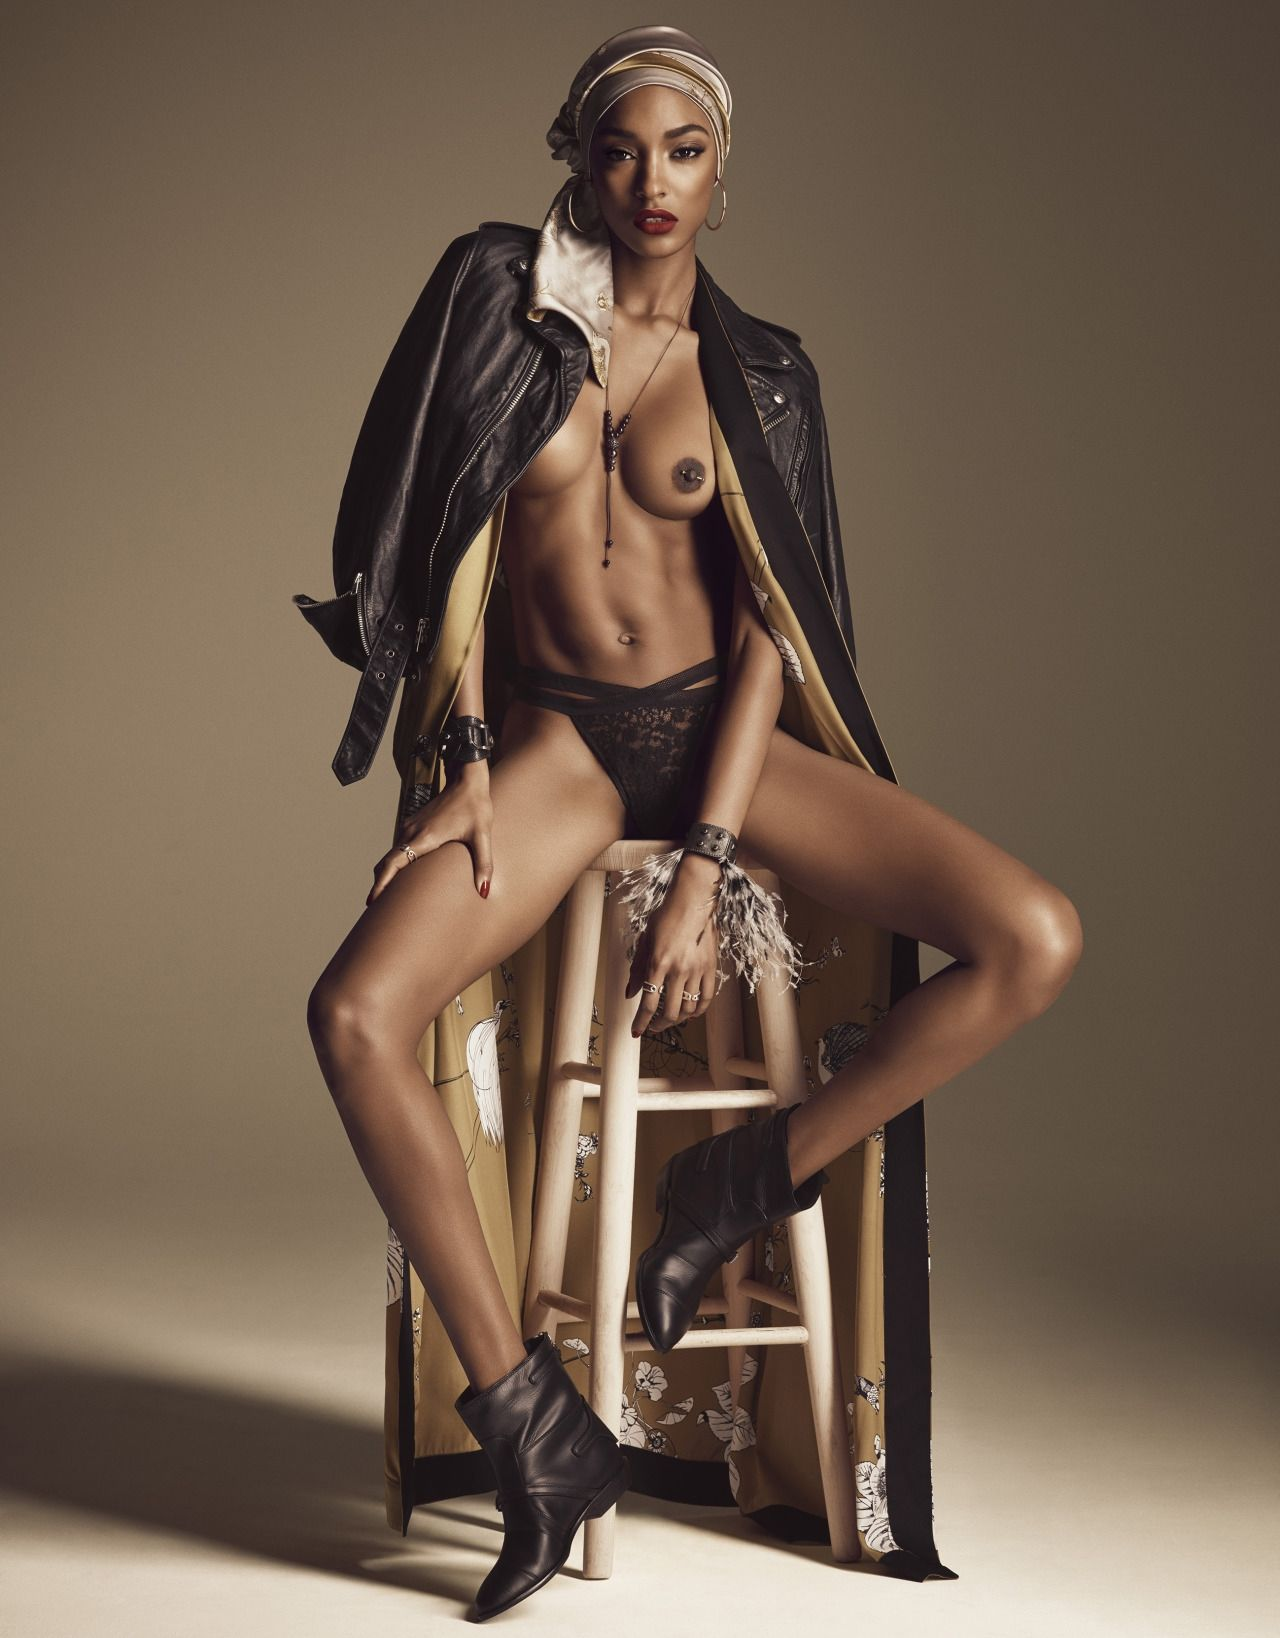 Kathryn Kampovsky Nude Model Photoshoot By Mark Harless